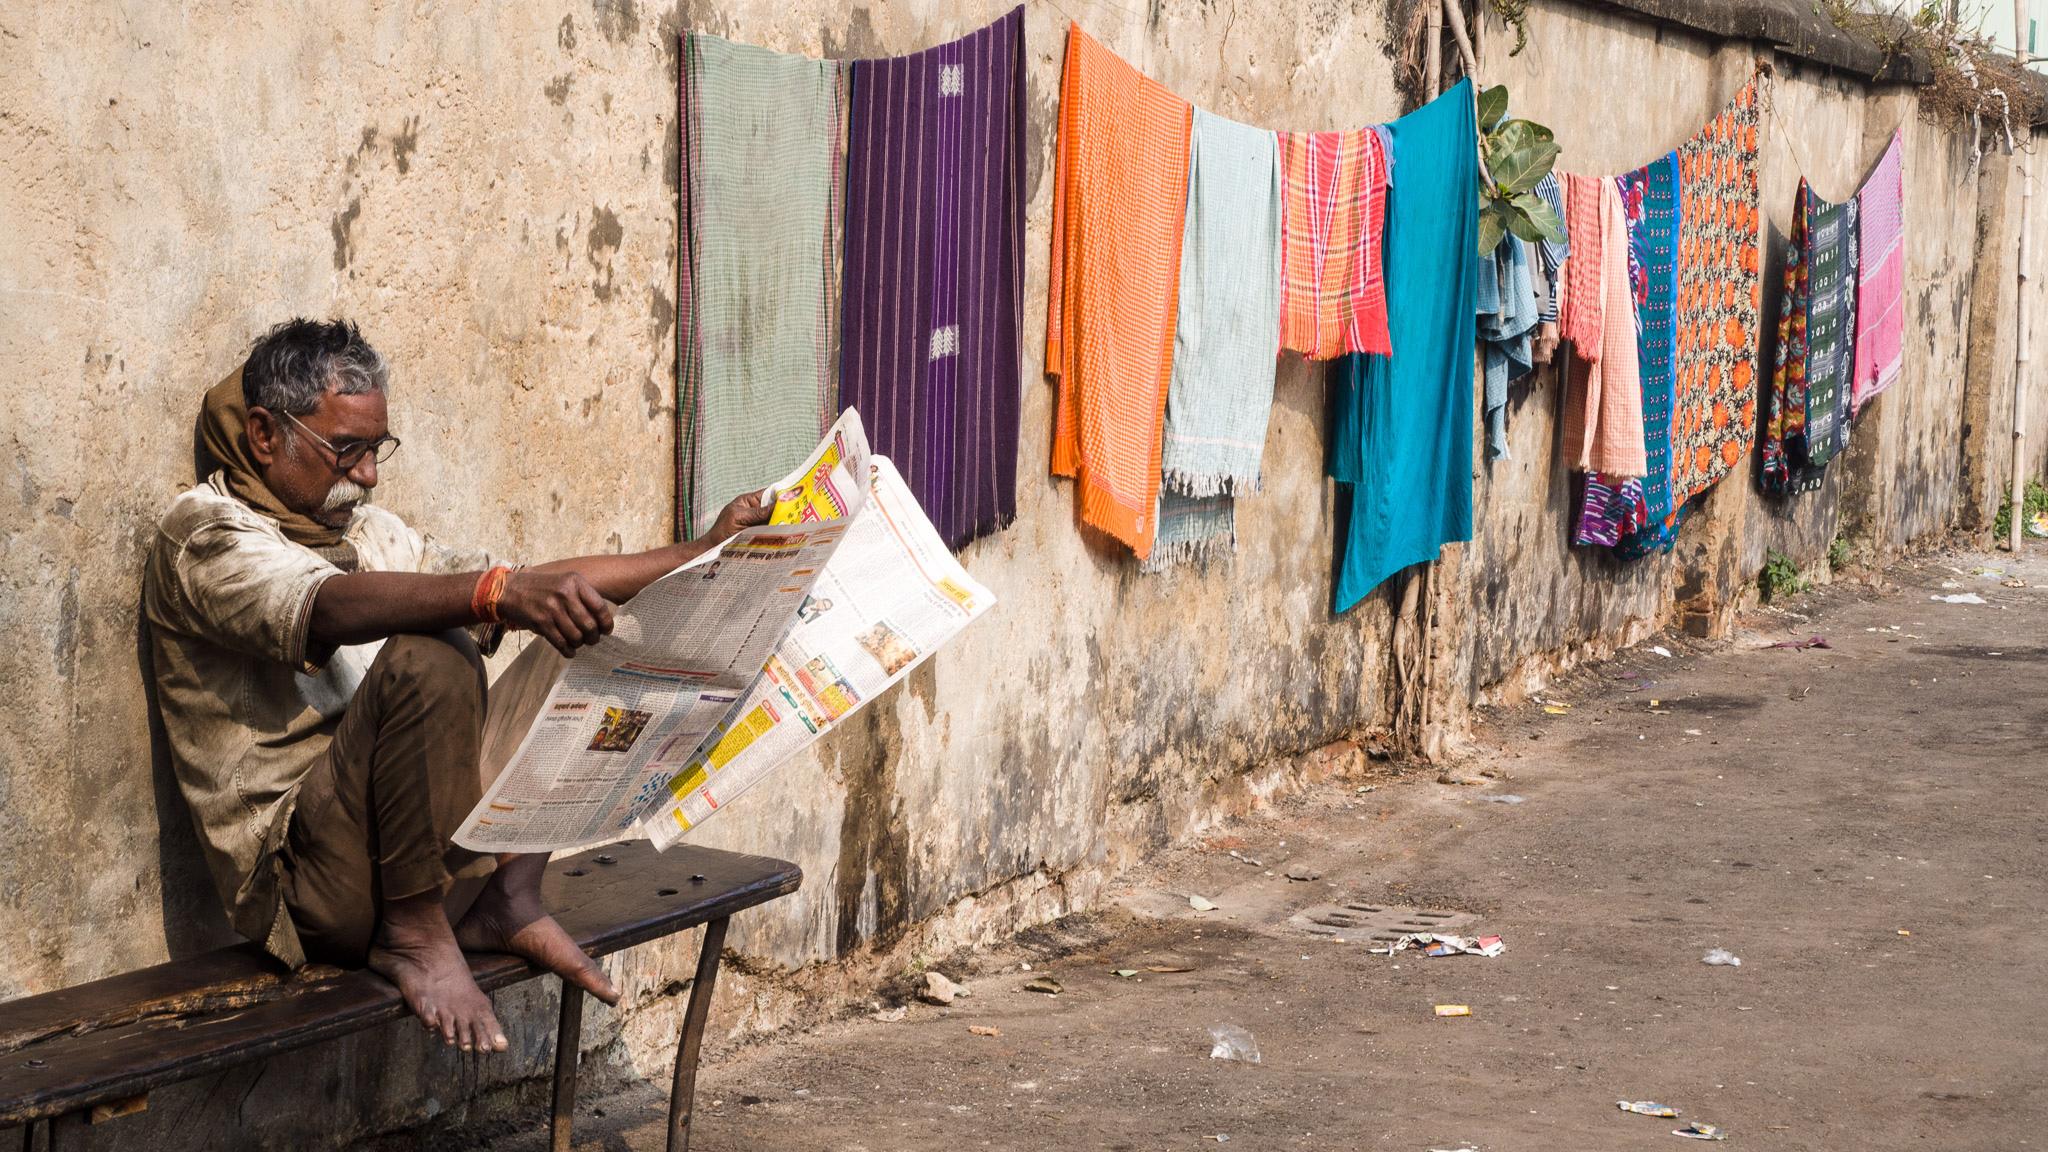 Man_Reading_Newspaper_in_India_Mike_Prince.jpg